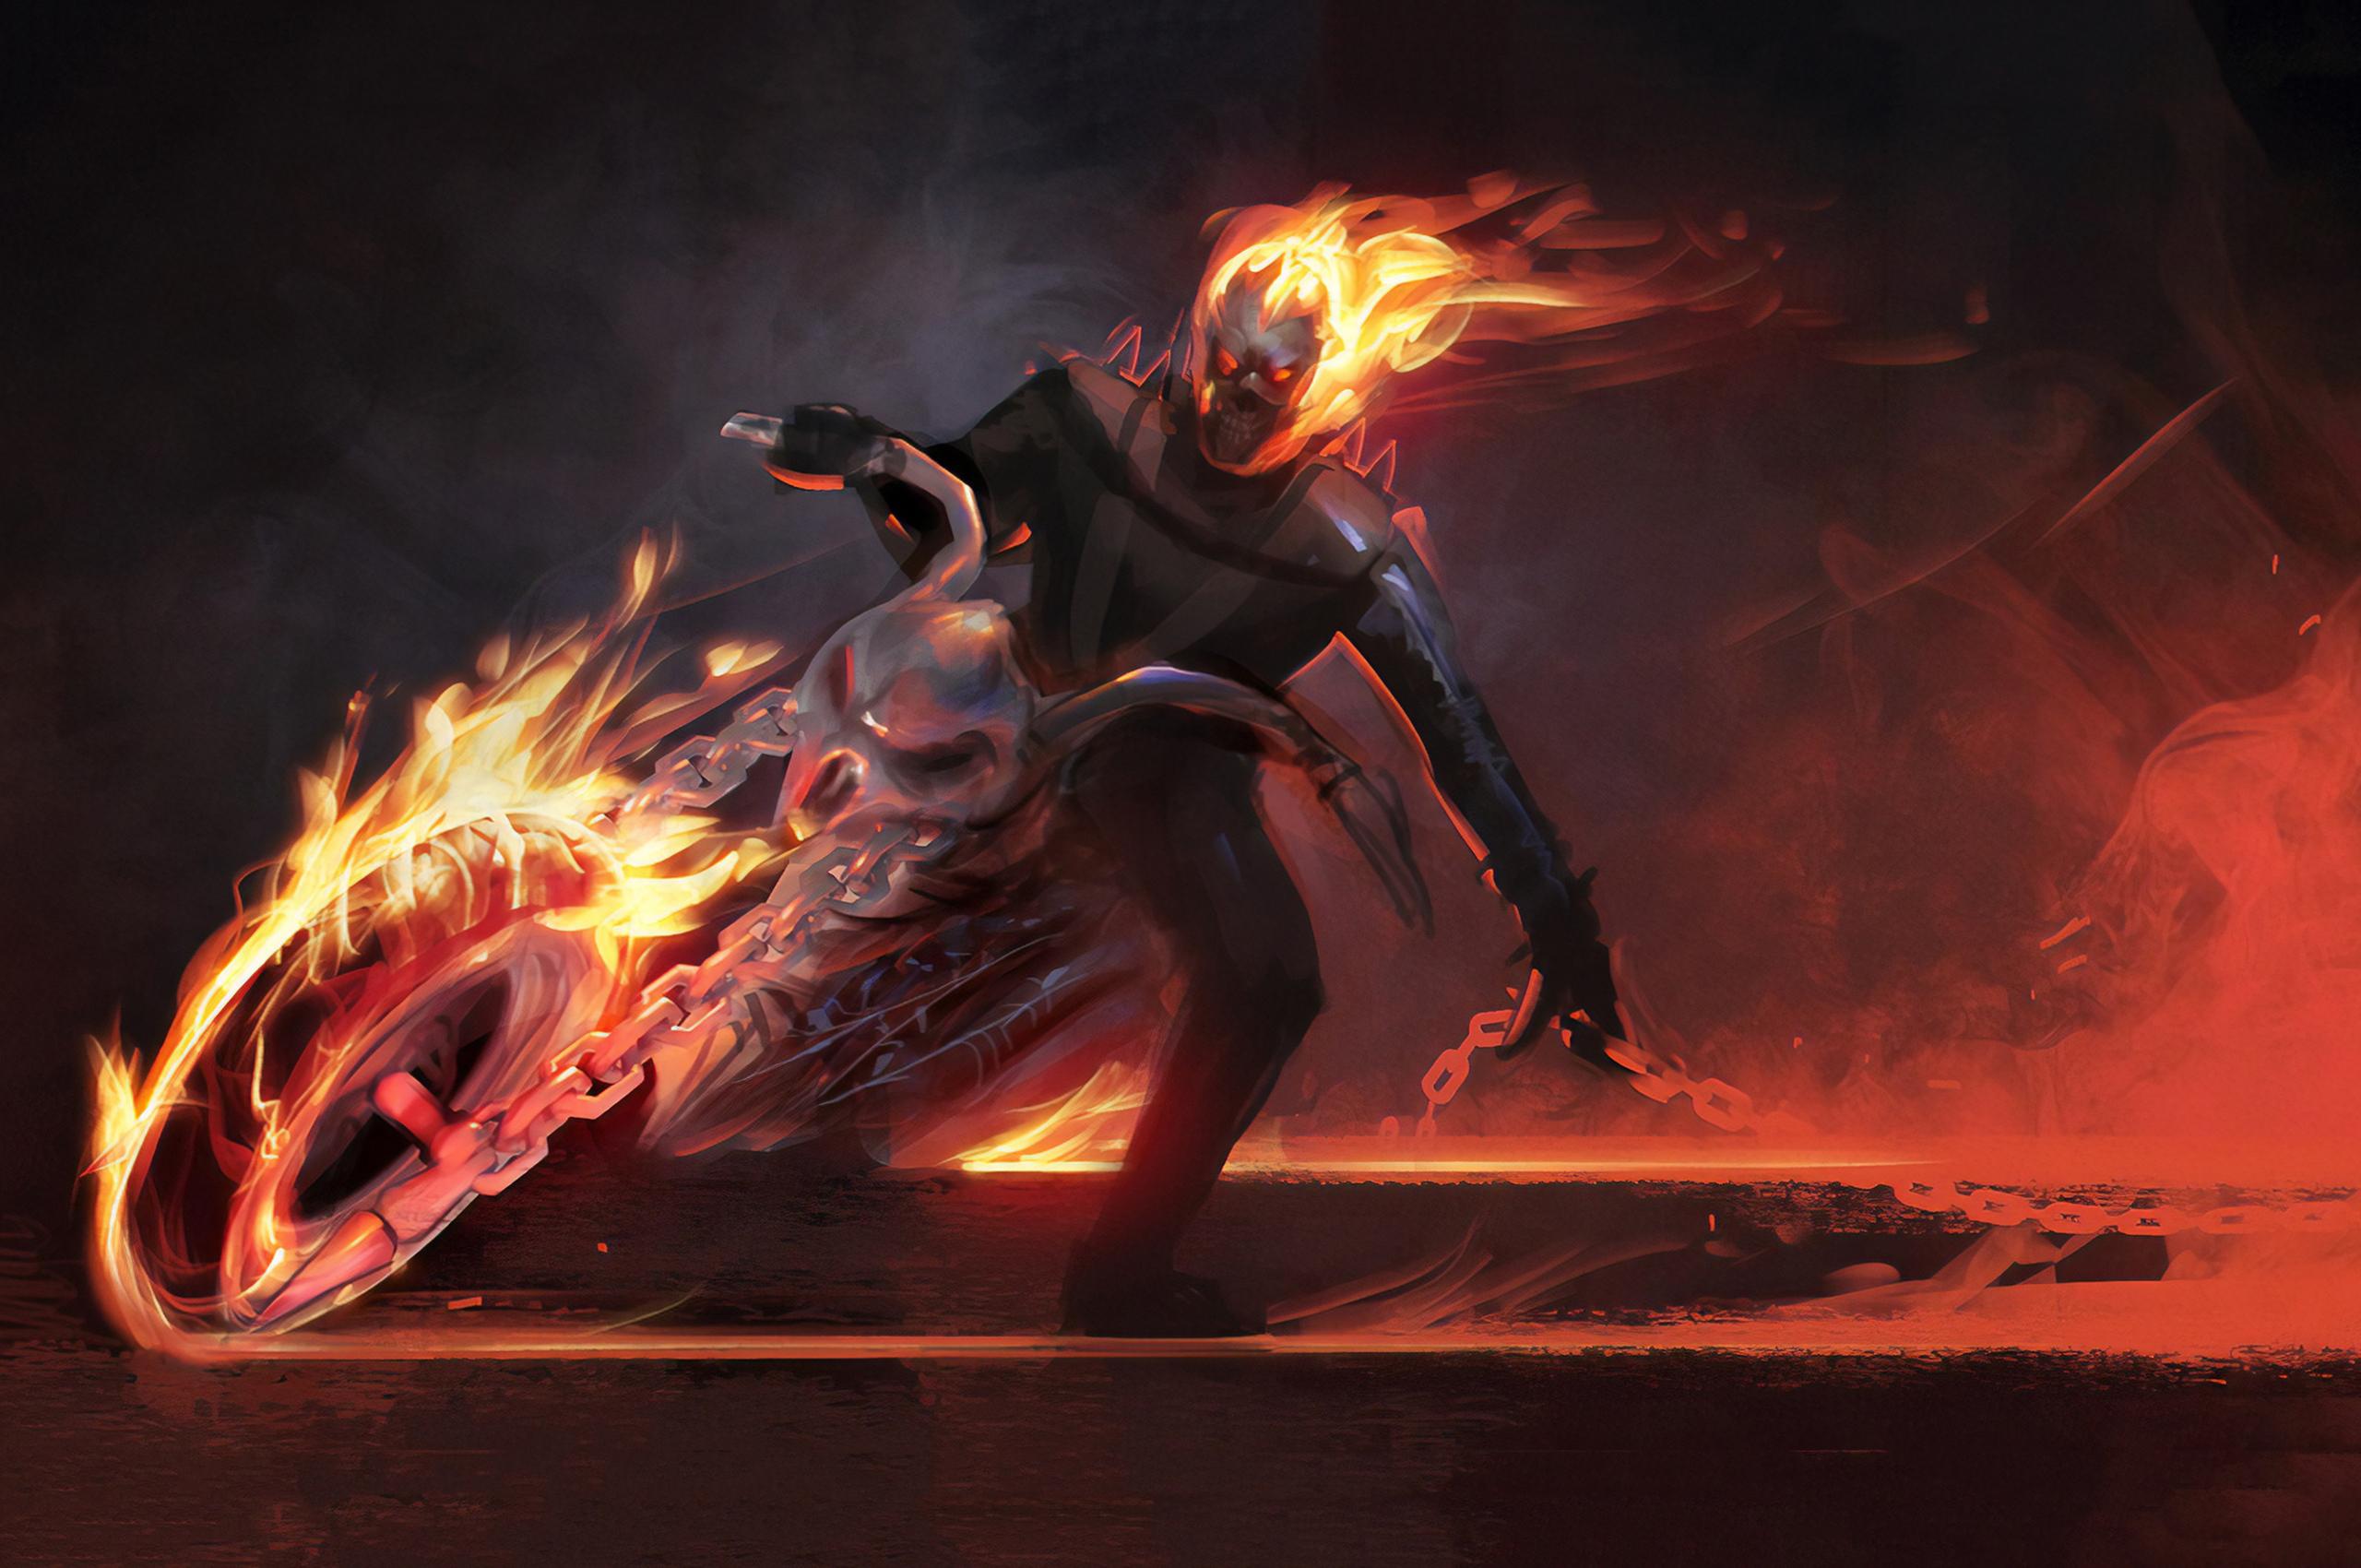 2560x1700 Ghost Rider Spirit Of Vengeance Game Chromebook Pixel Hd